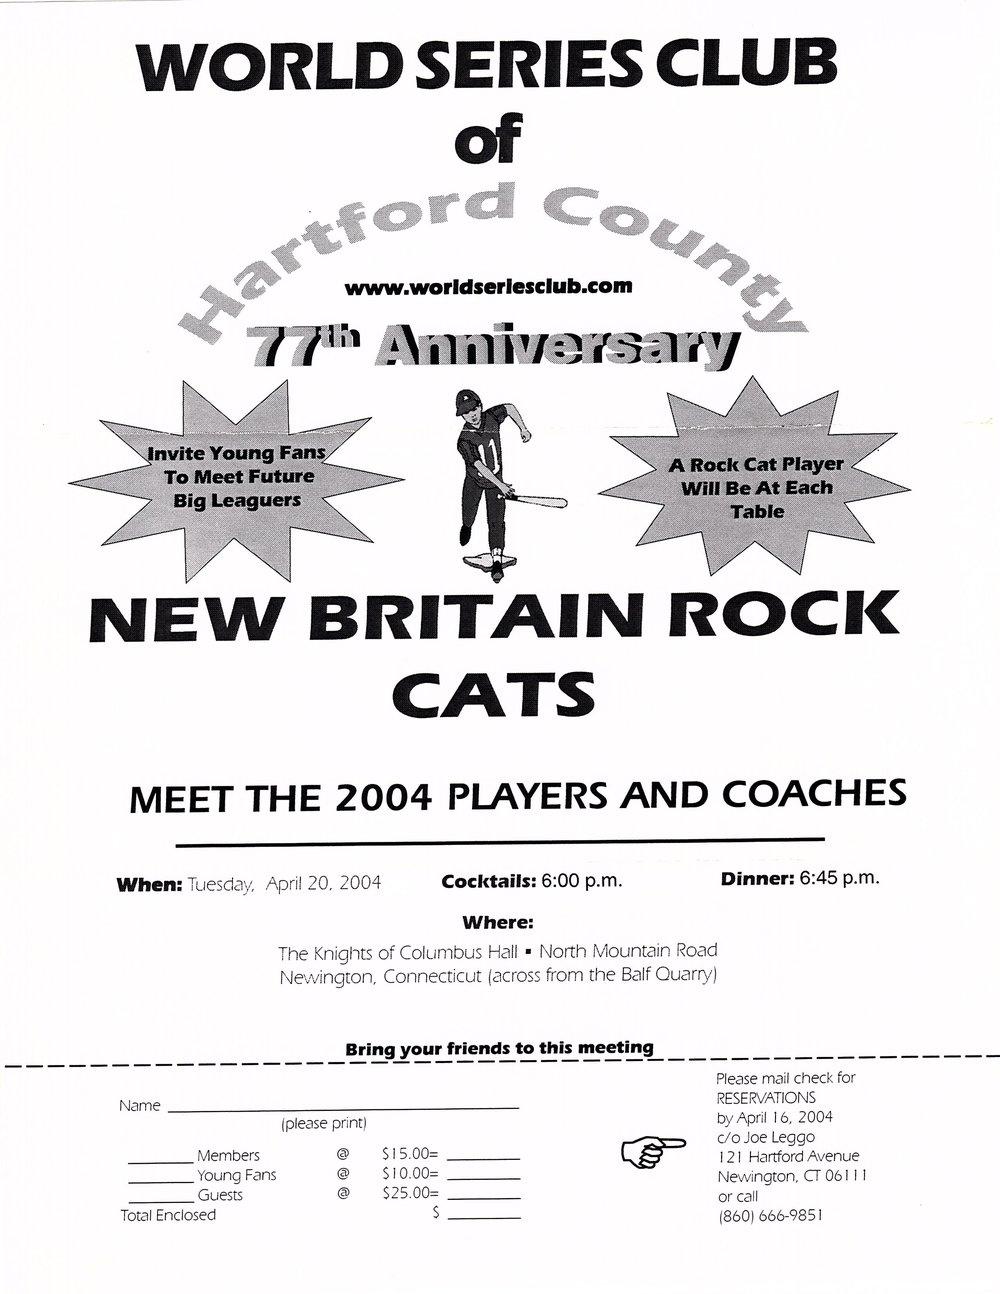 20040420 New Britain Rock Cats.jpg